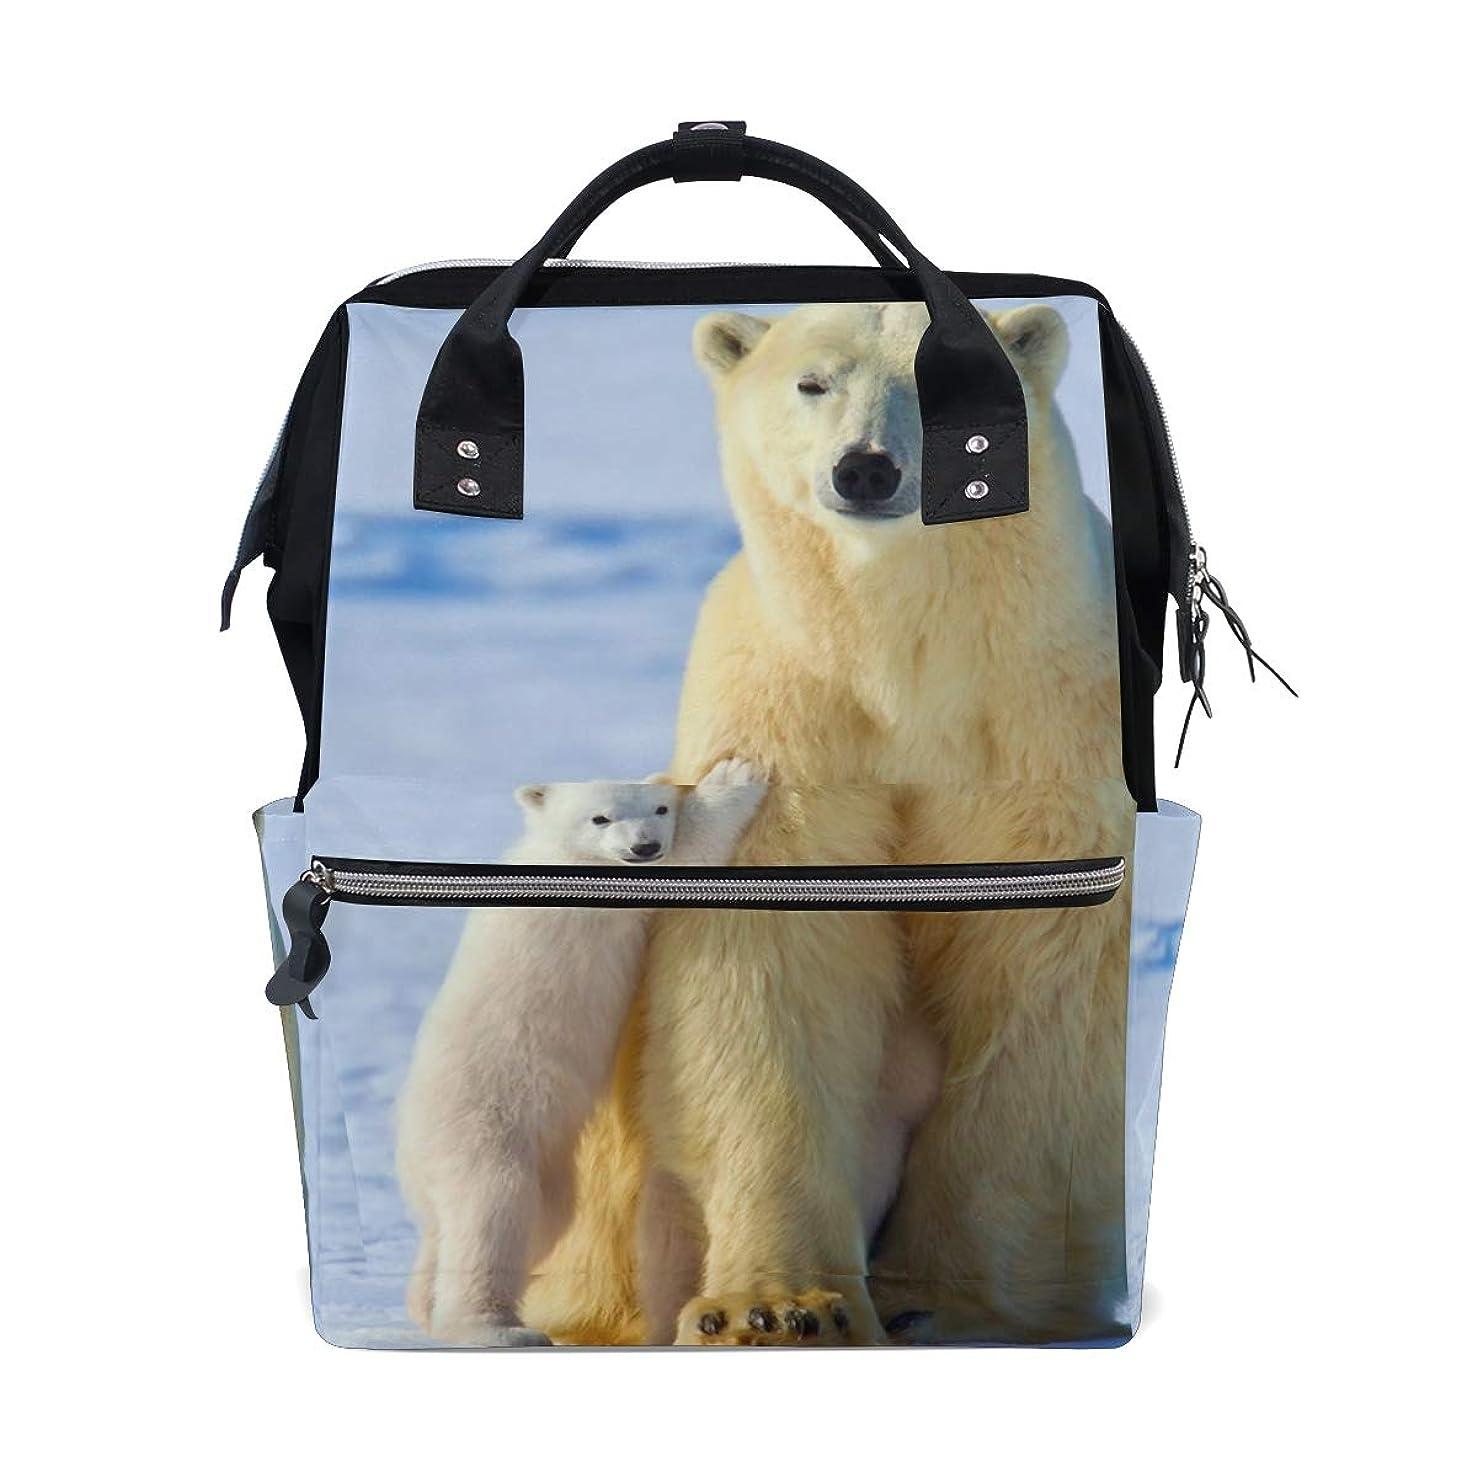 Polar Bear School Backpack Large Capacity Mummy Bags Laptop Handbag Casual Travel Rucksack Satchel For Women Men Adult Teen Children